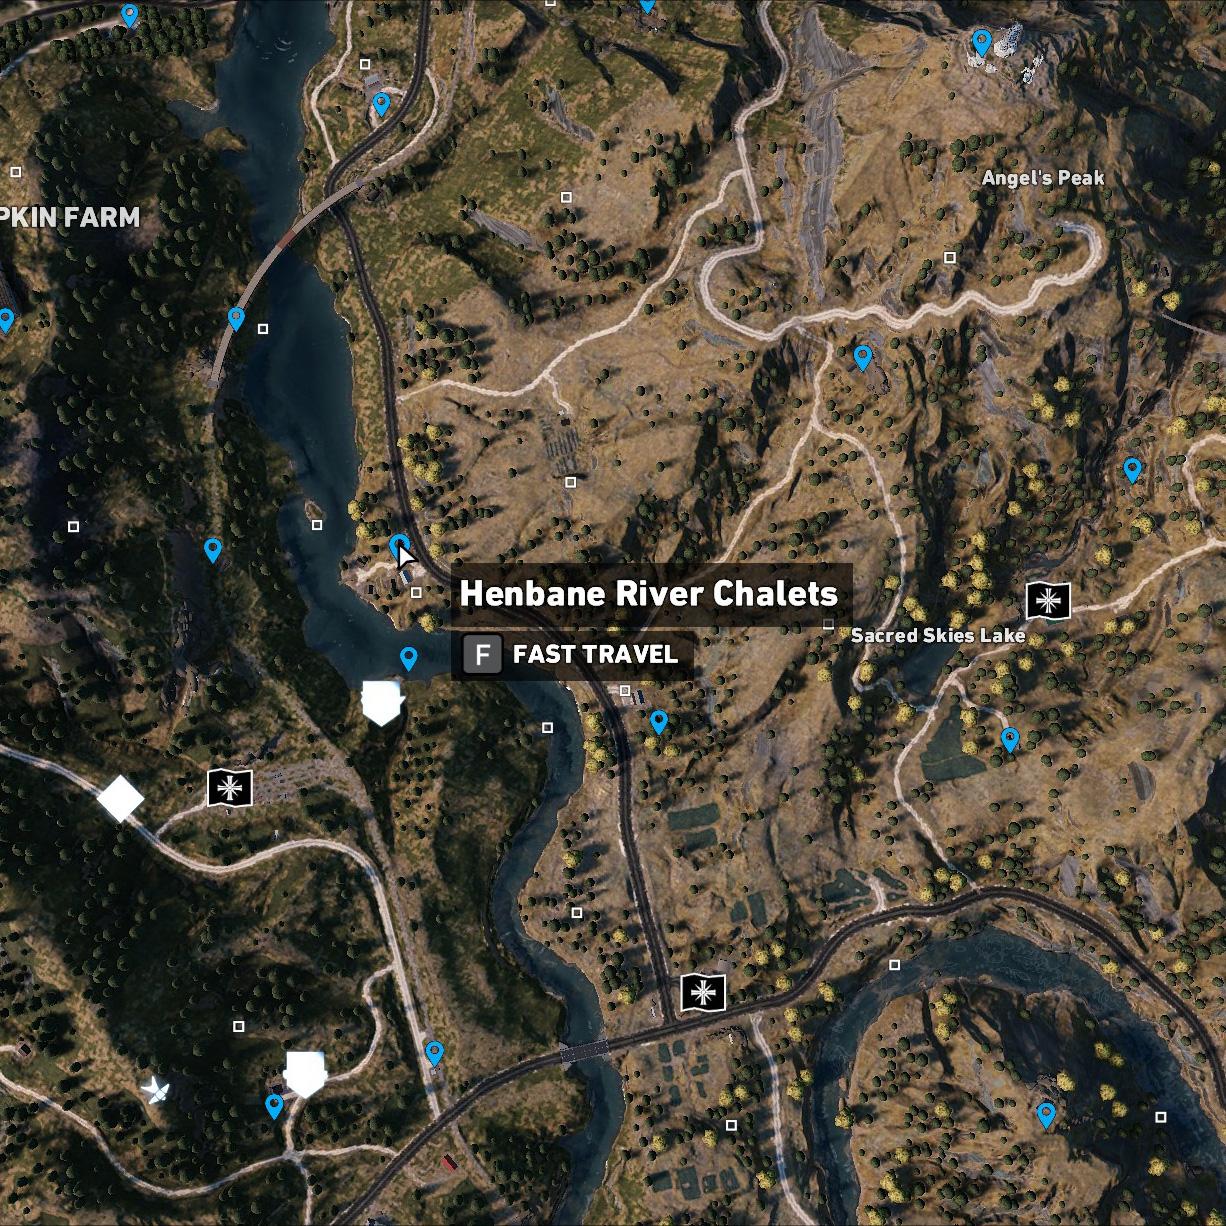 Henbane River Chalets